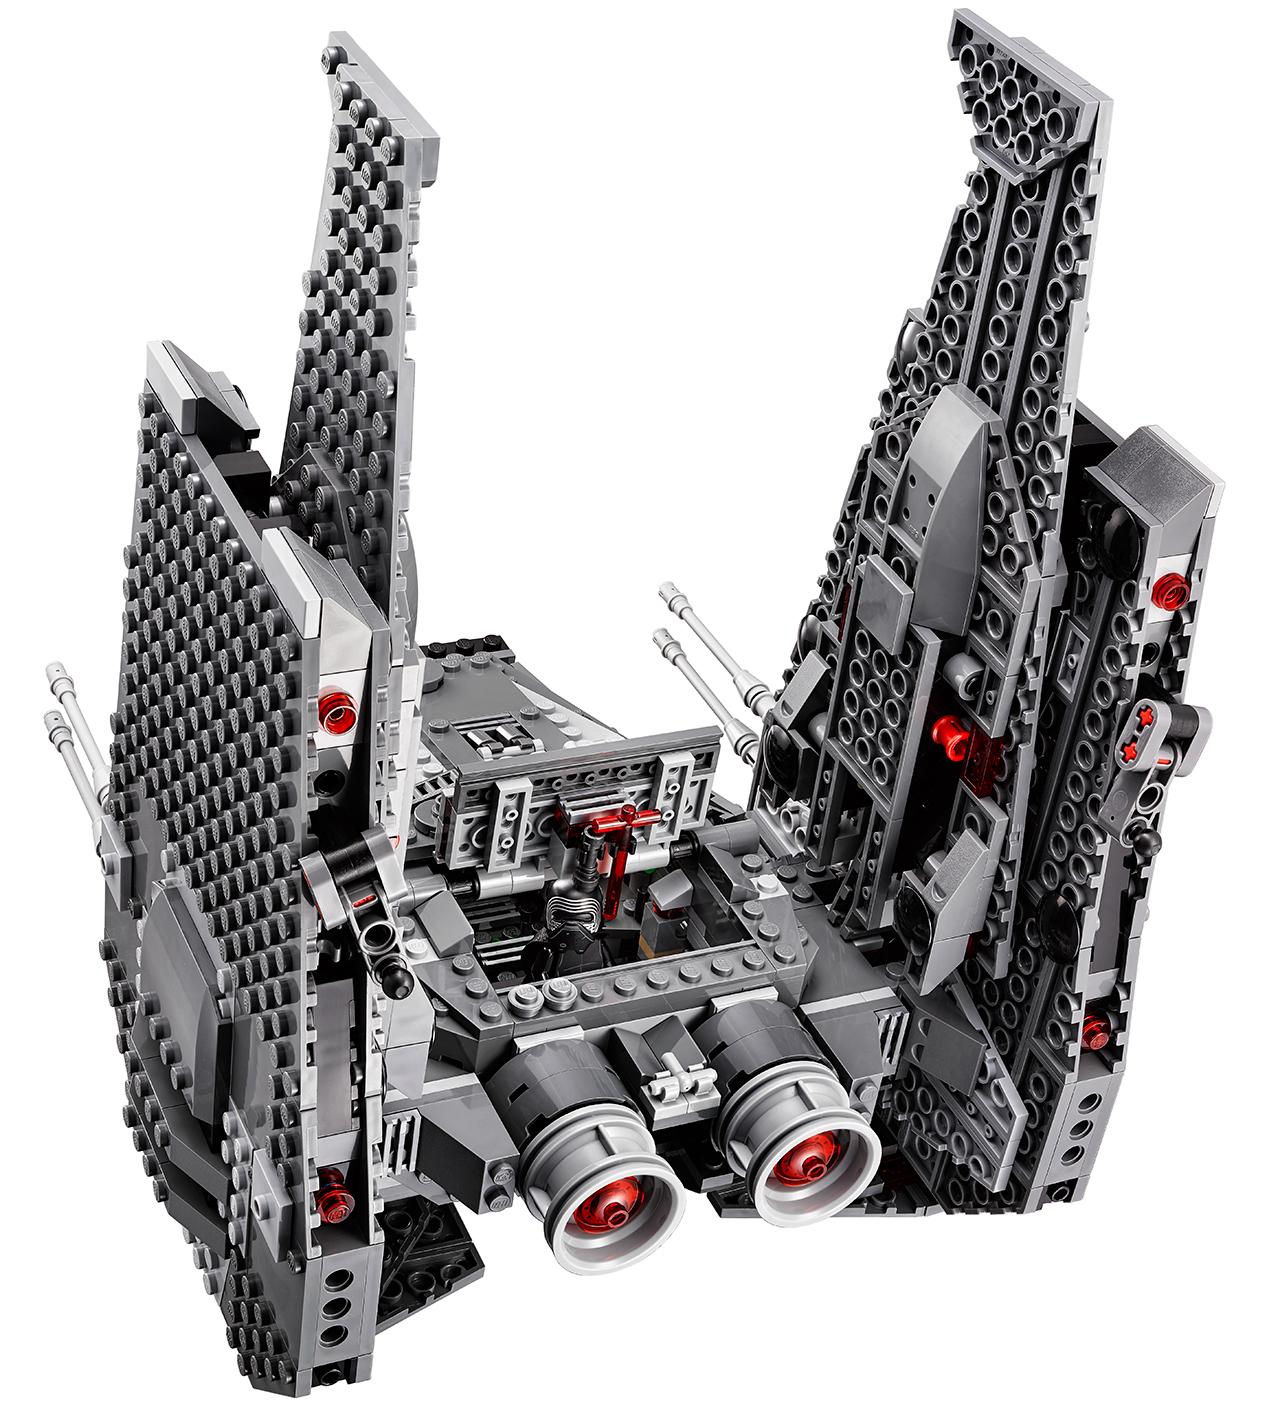 kylo ren space shuttle lego - photo #8